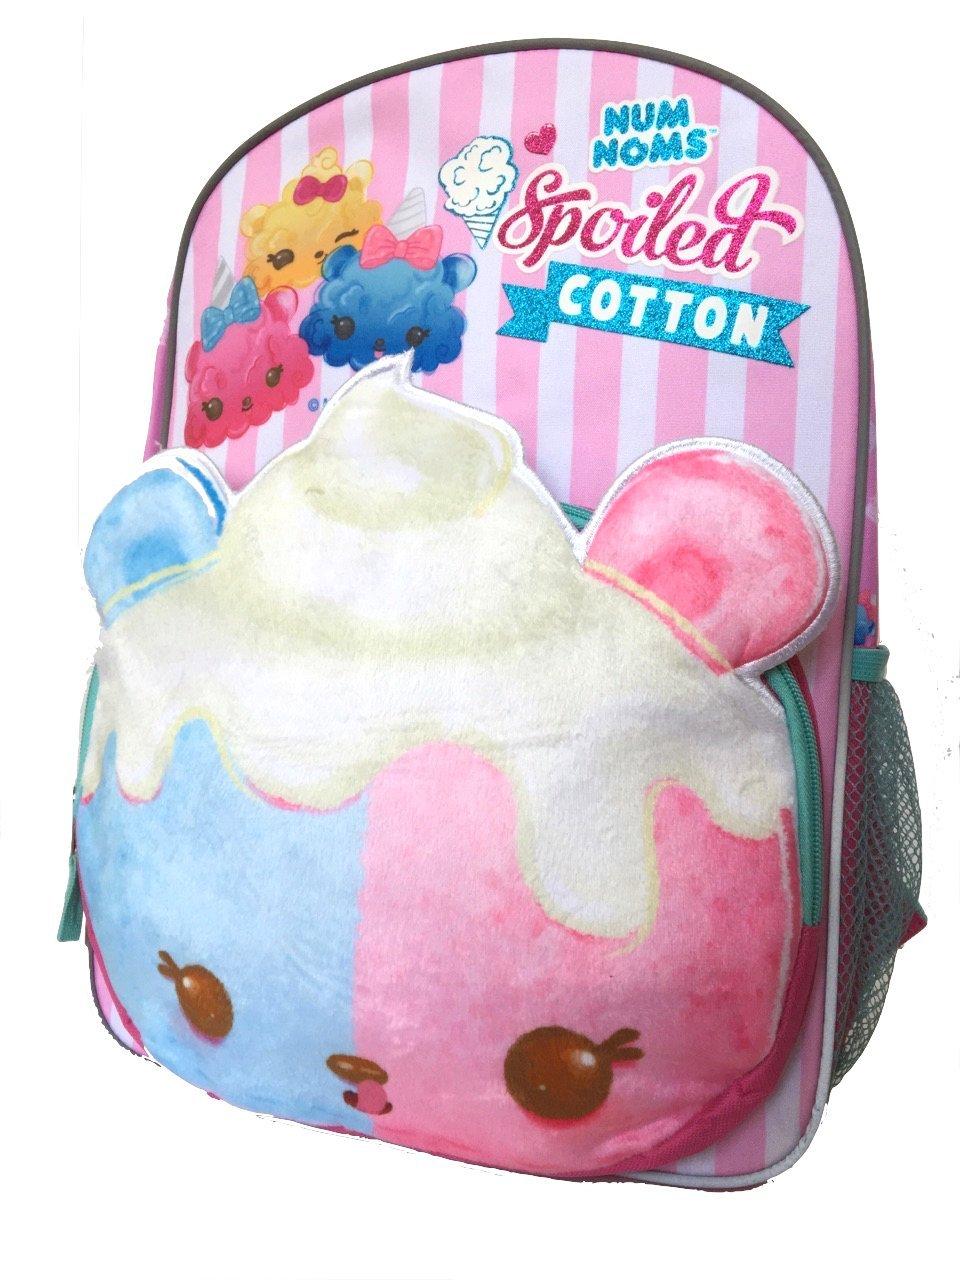 Num Noms 16'' Cotton Candy Backpack